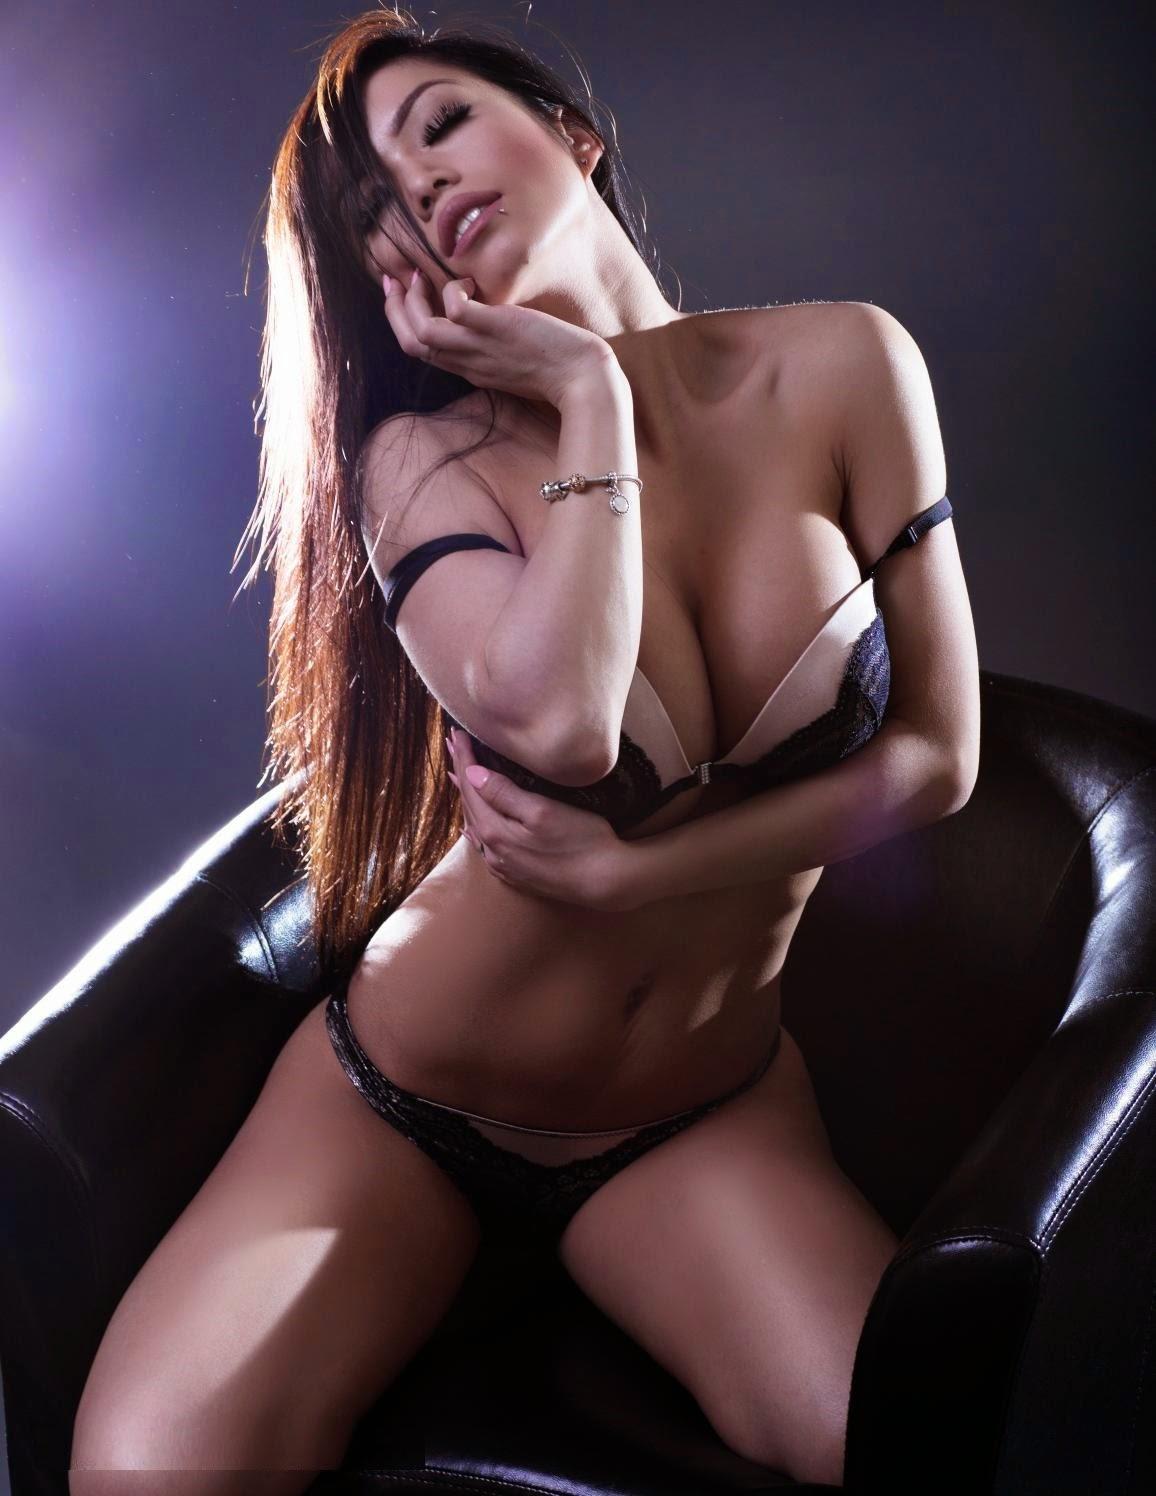 donna pham sexy naked pics 02